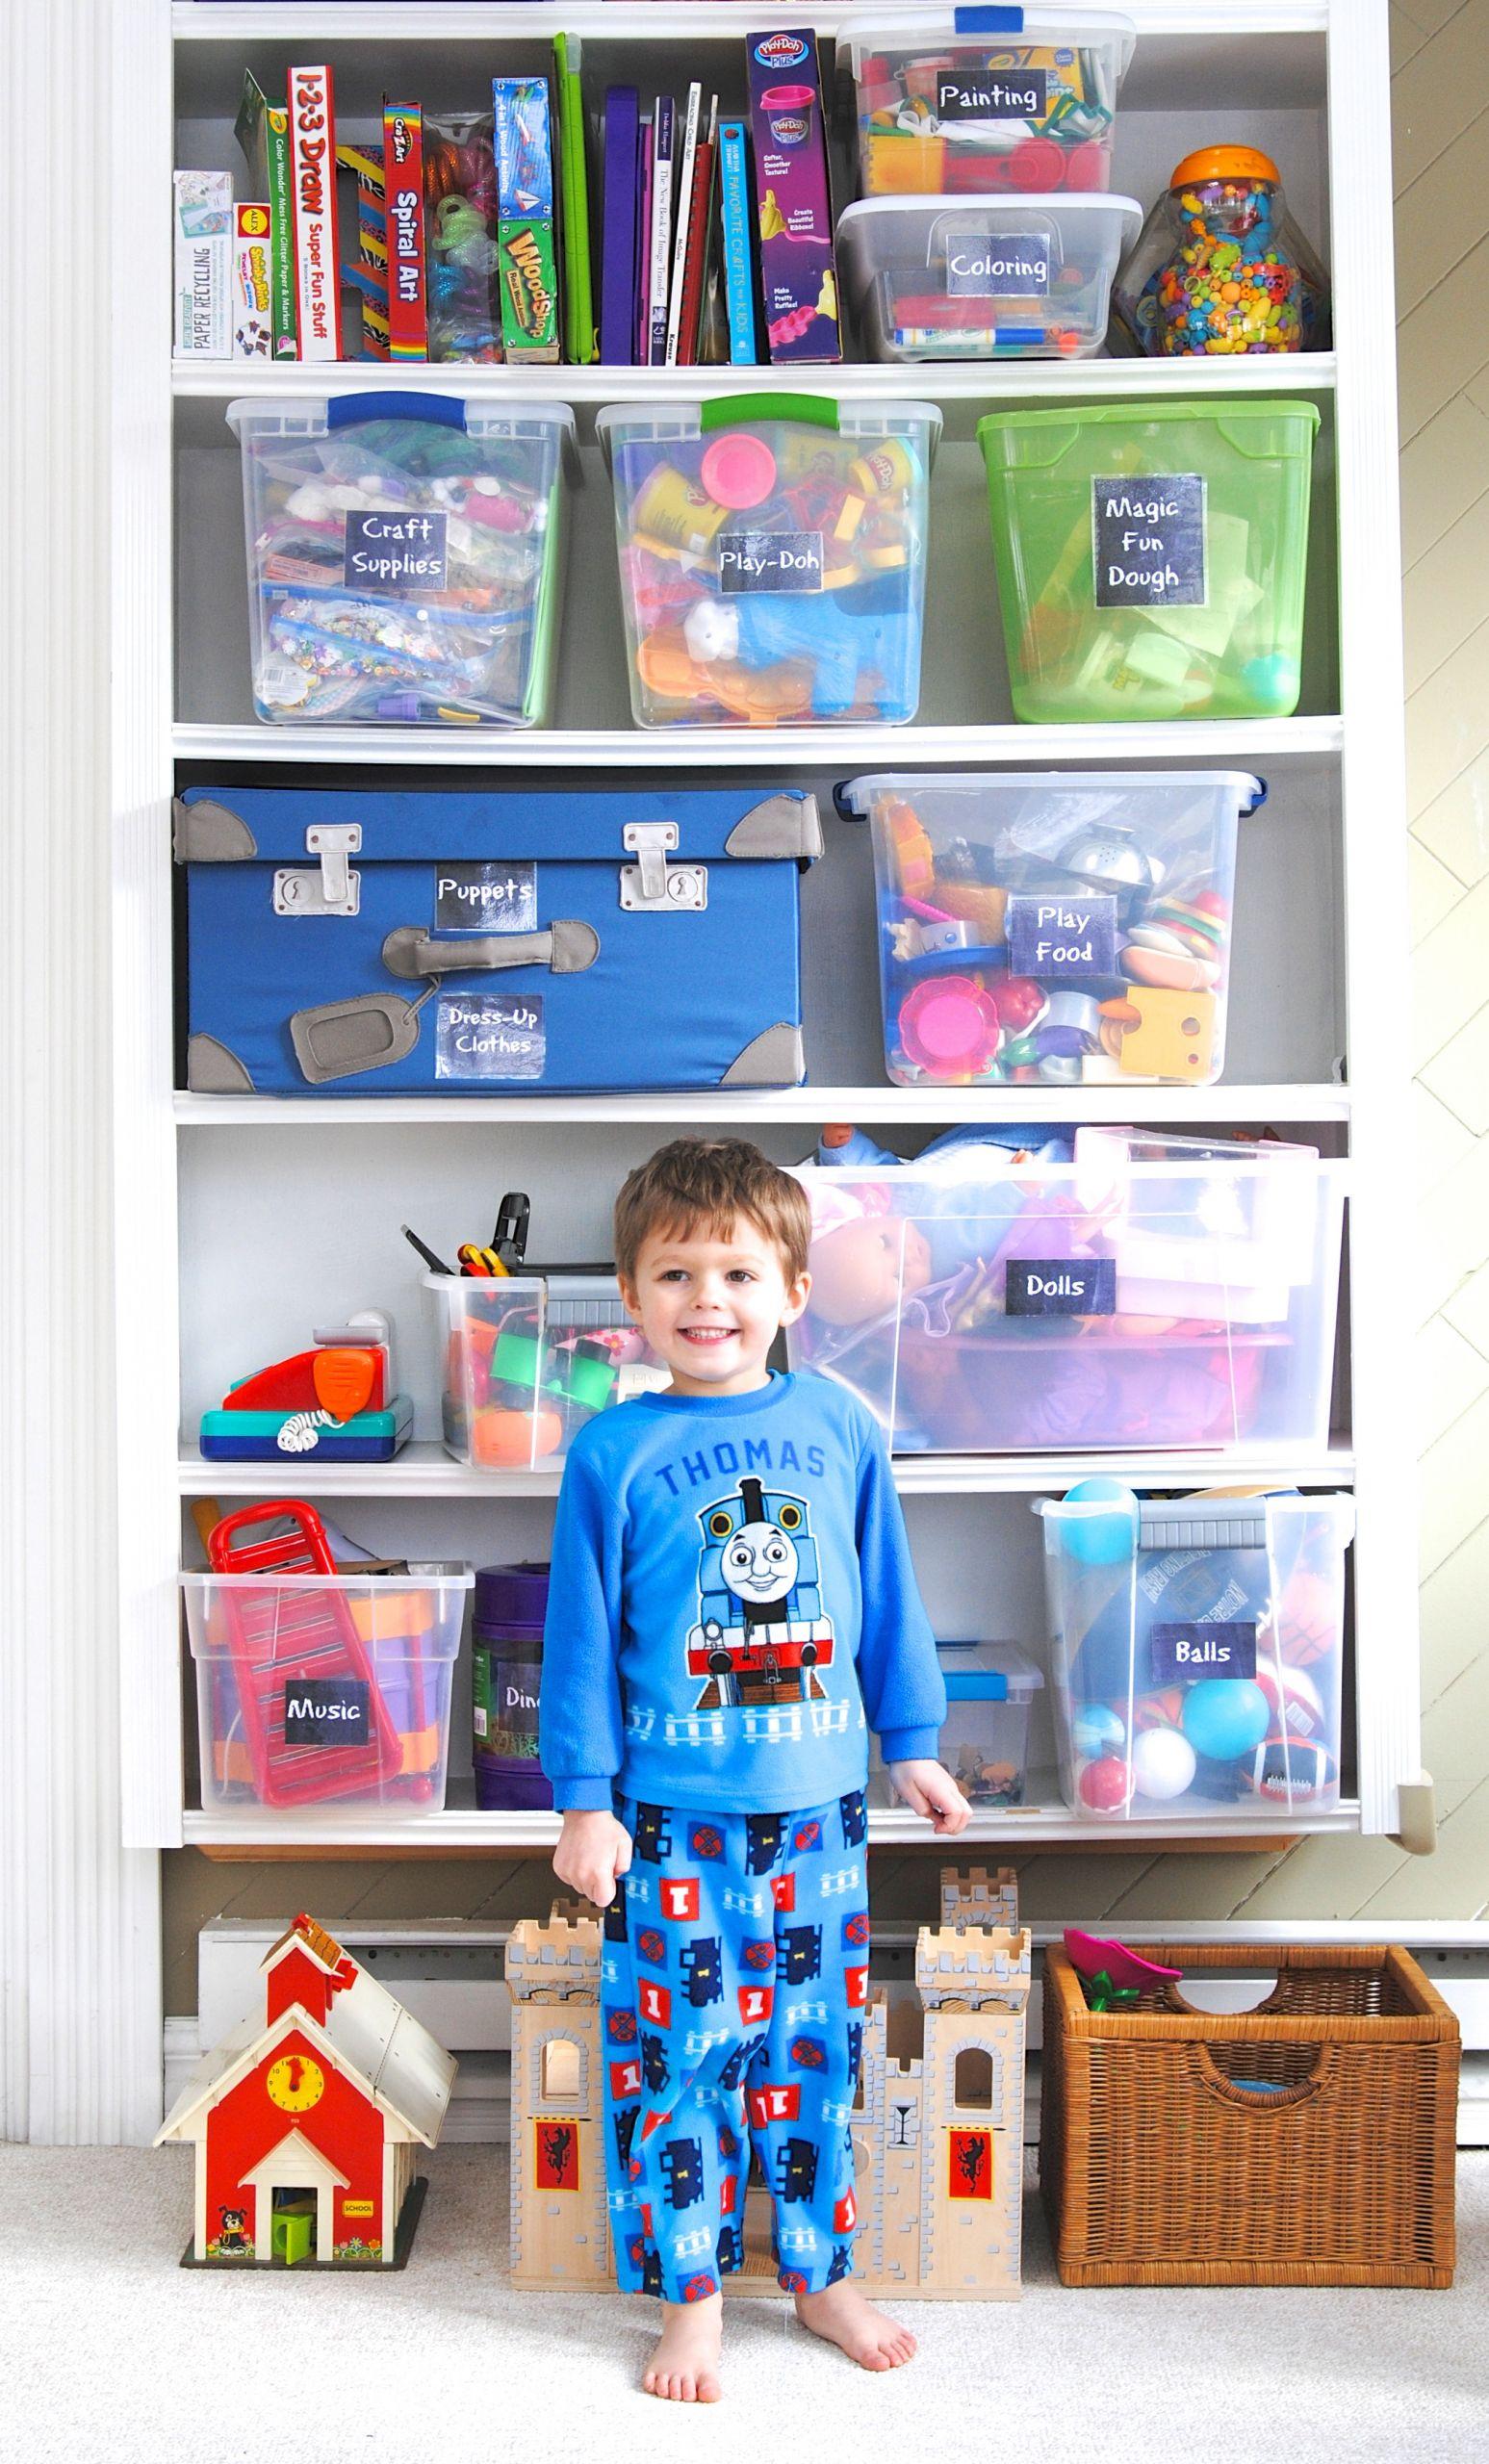 Kids Toy Organizing Ideas  Toy Organization 101 Taming the Toys